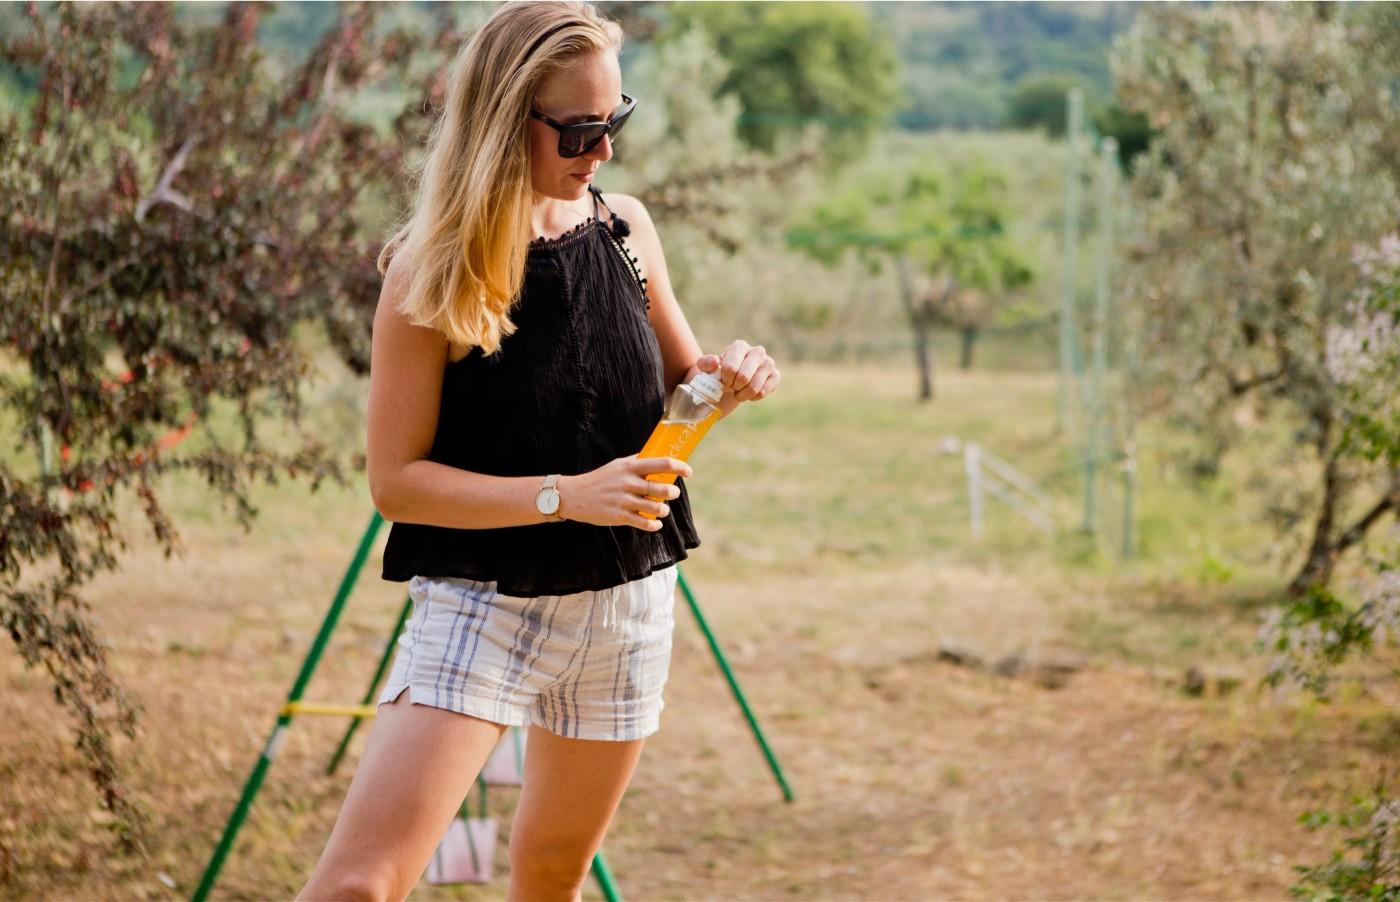 <em>Ciao Toscana!</em> getting summer ready with Quickcap Sun